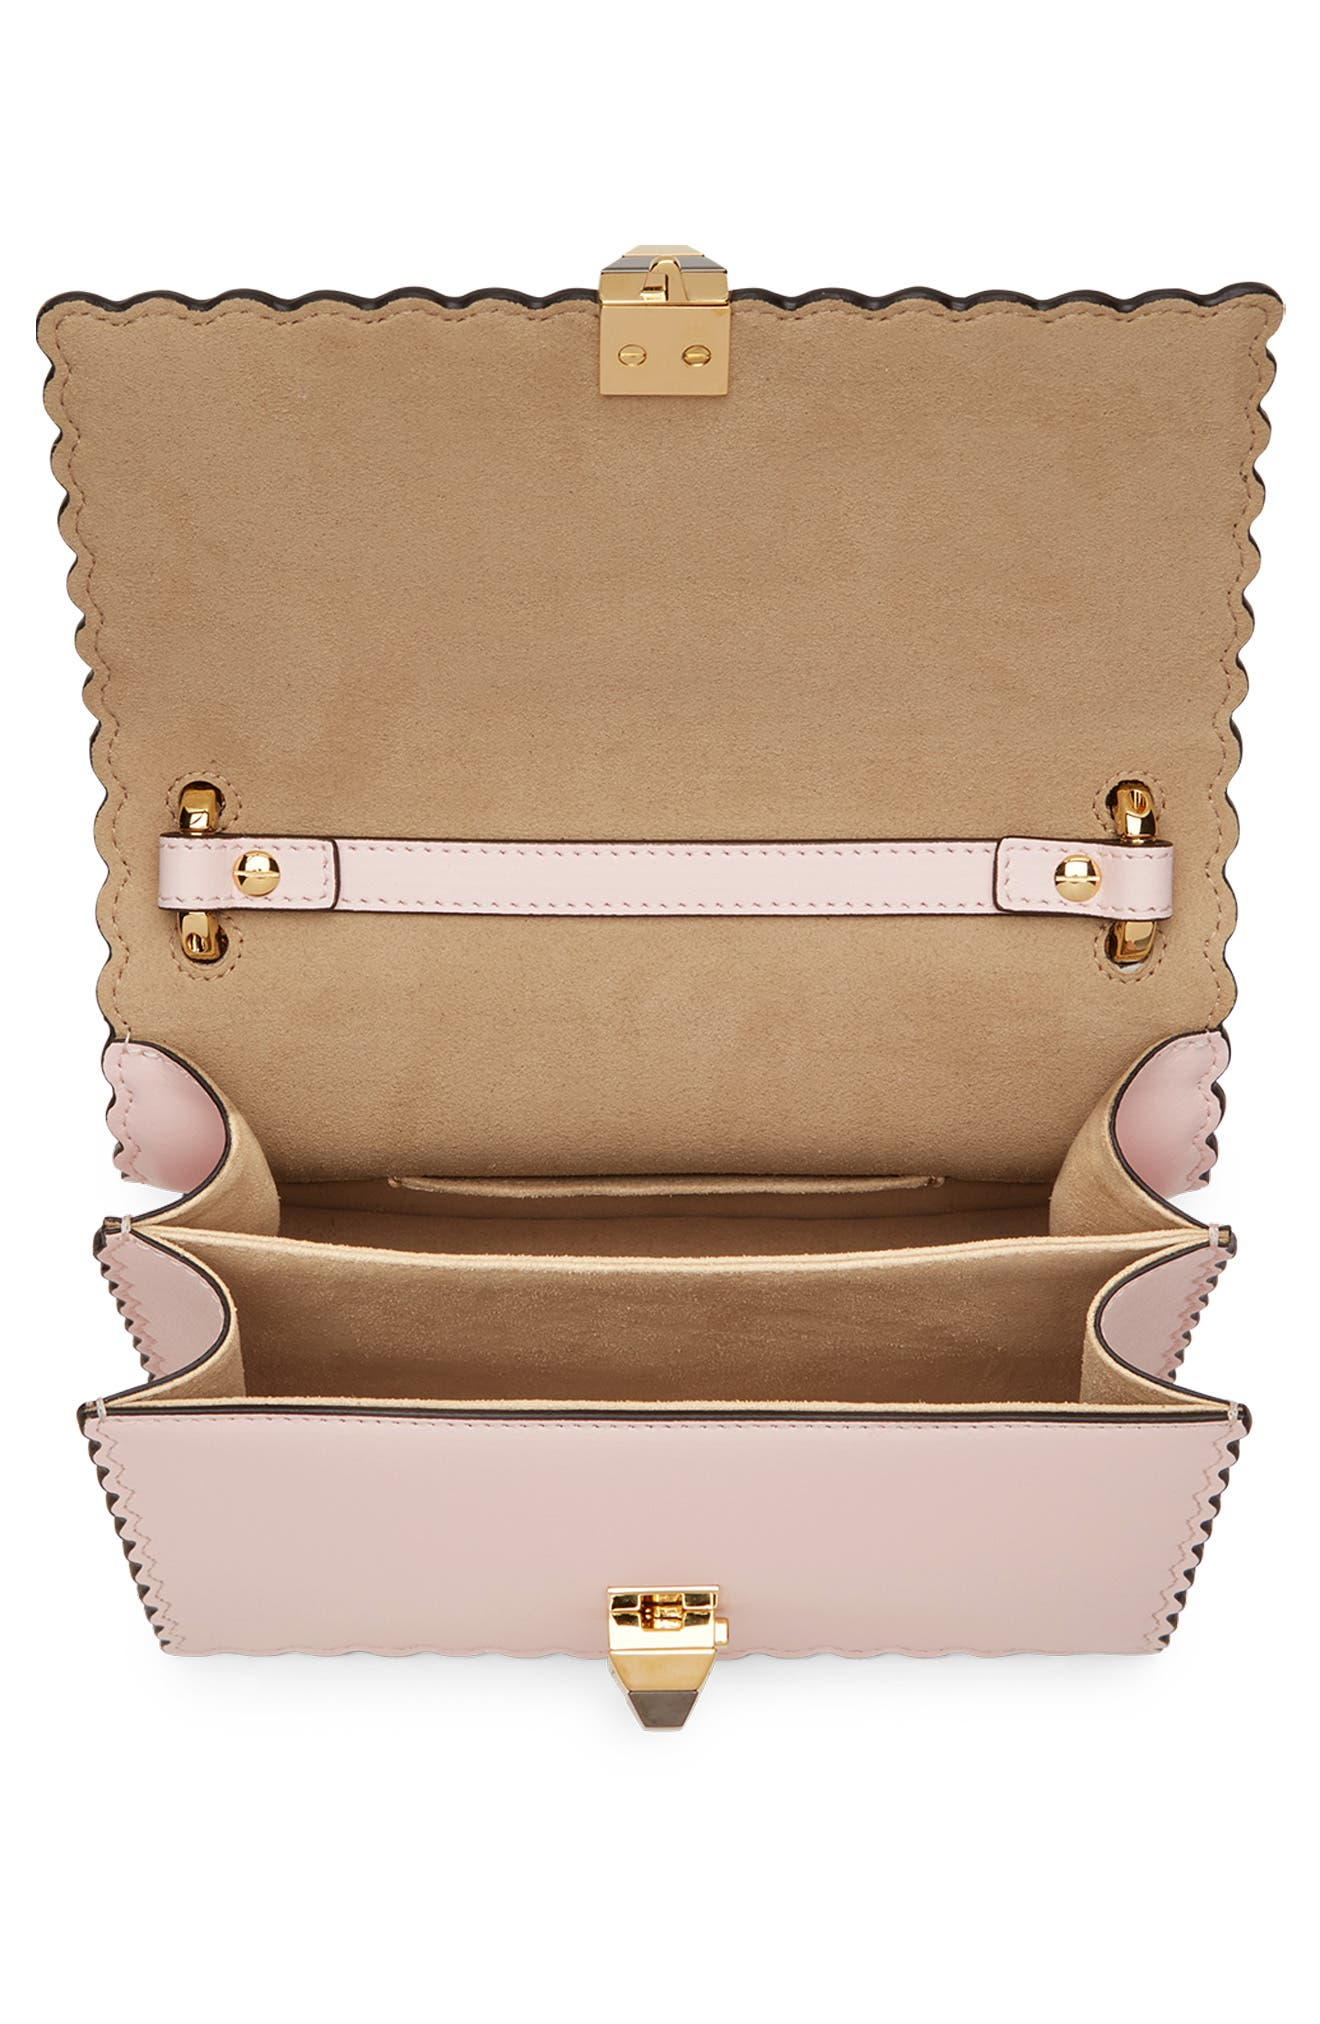 Mini Kan I Scalloped Leather Shoulder Bag,                             Alternate thumbnail 3, color,                             CONFETTO/ ORO SOFT